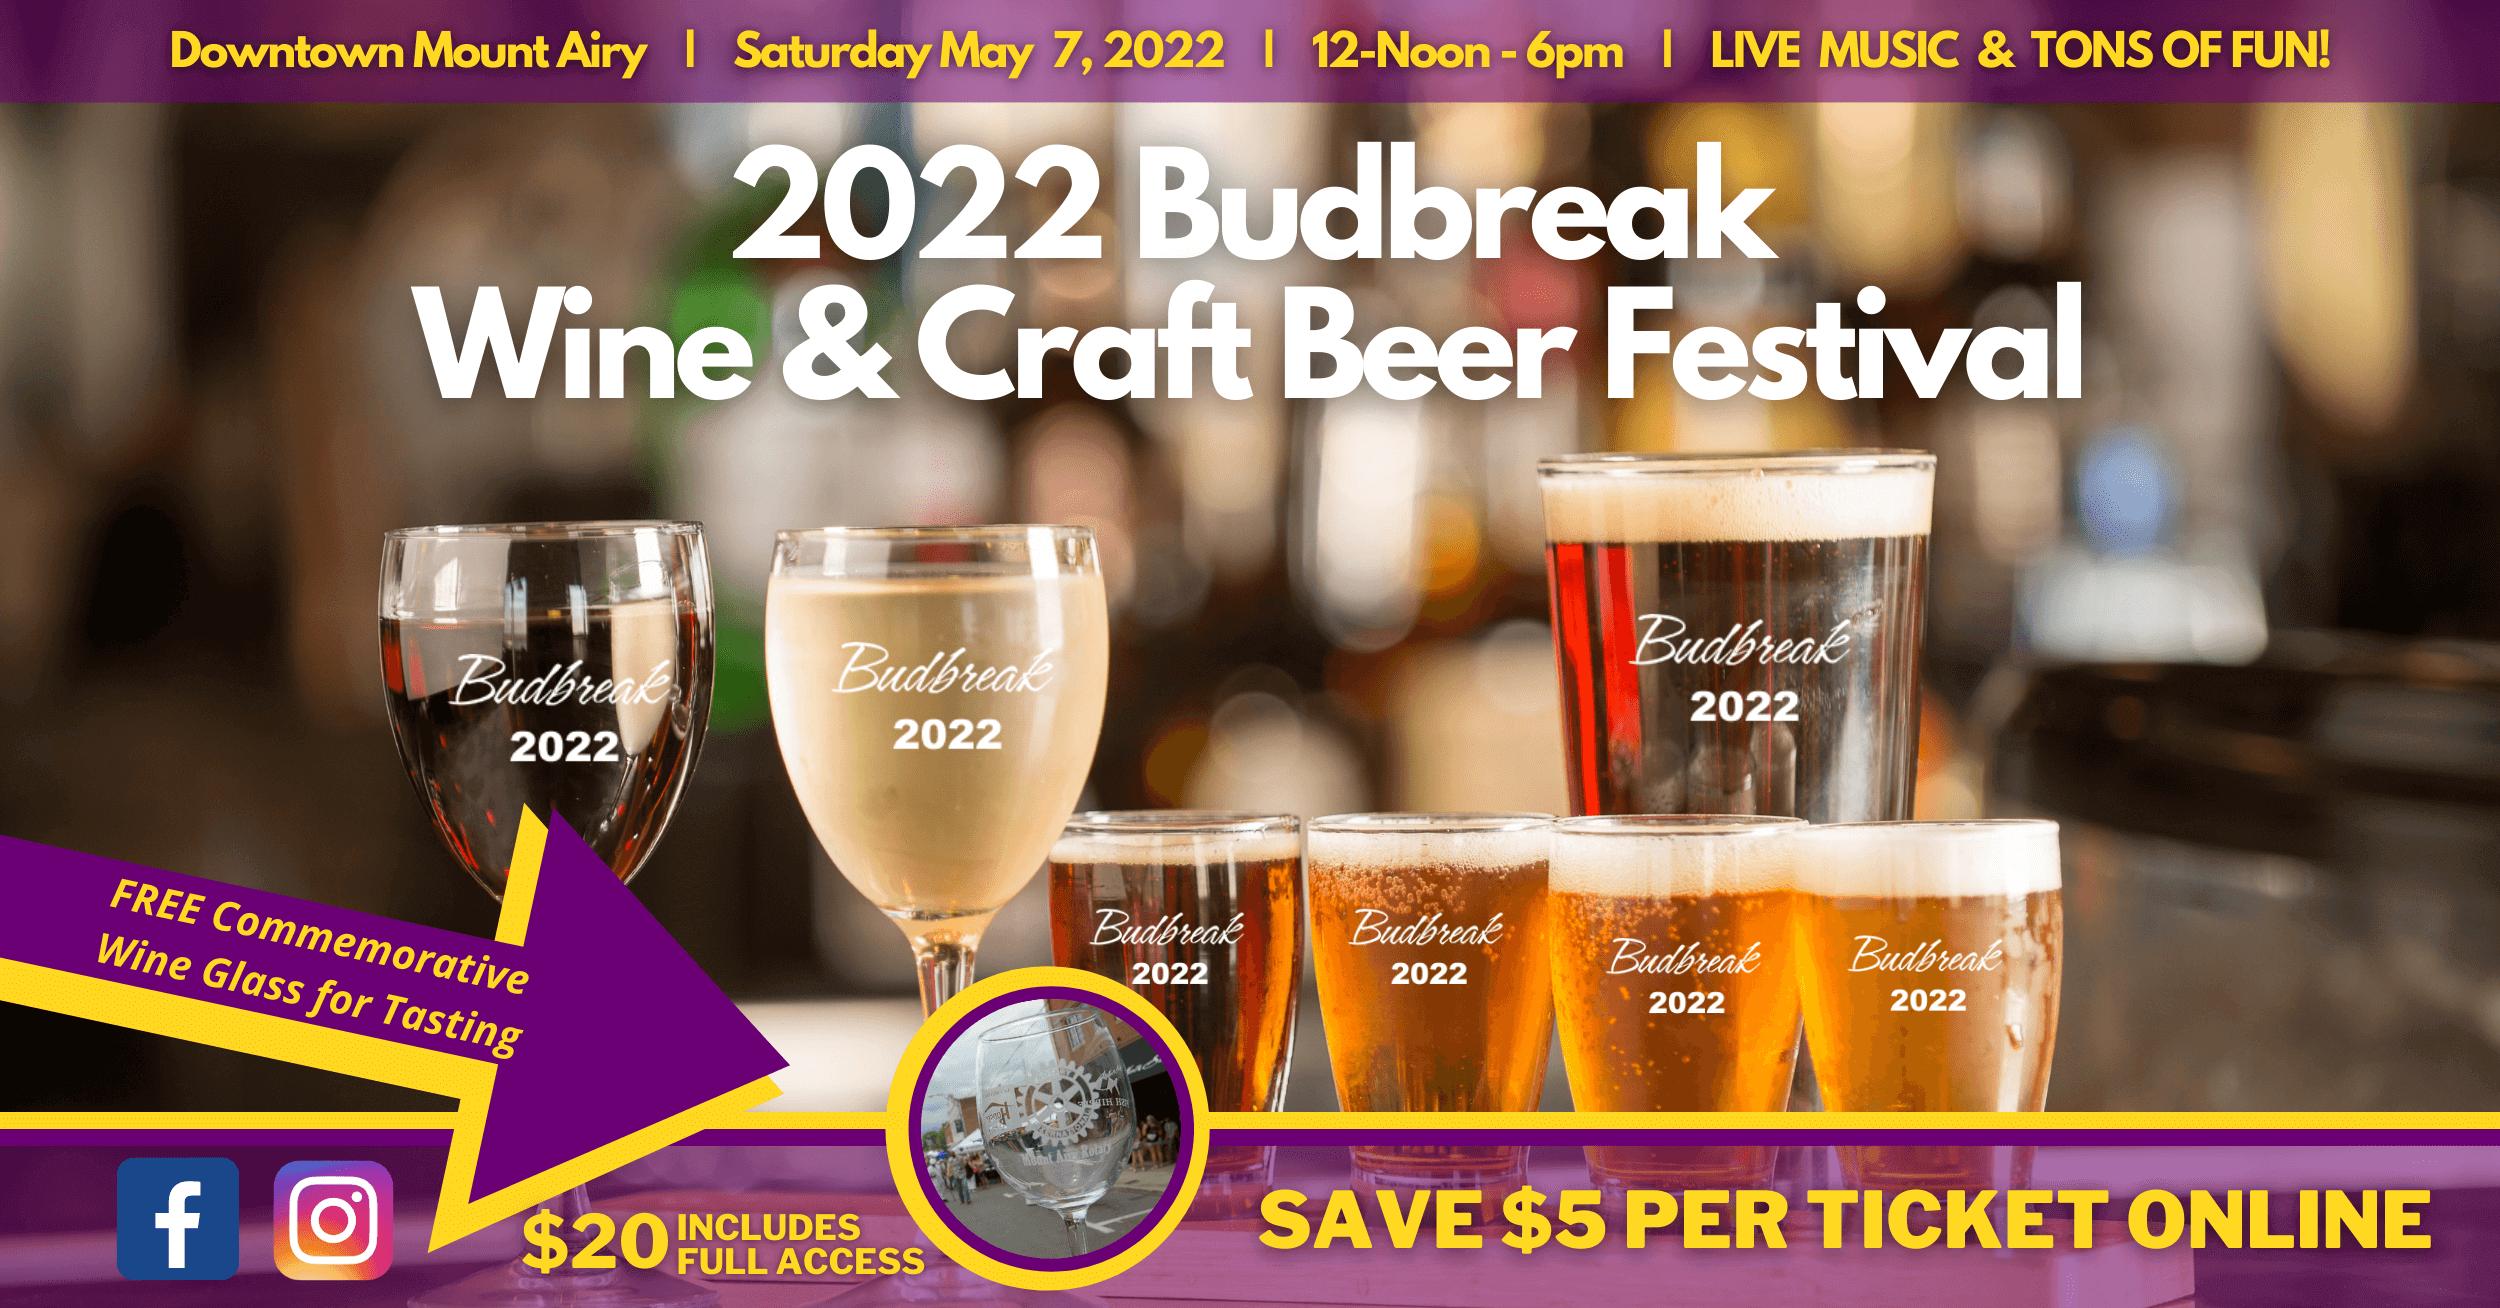 Budbreak Festival